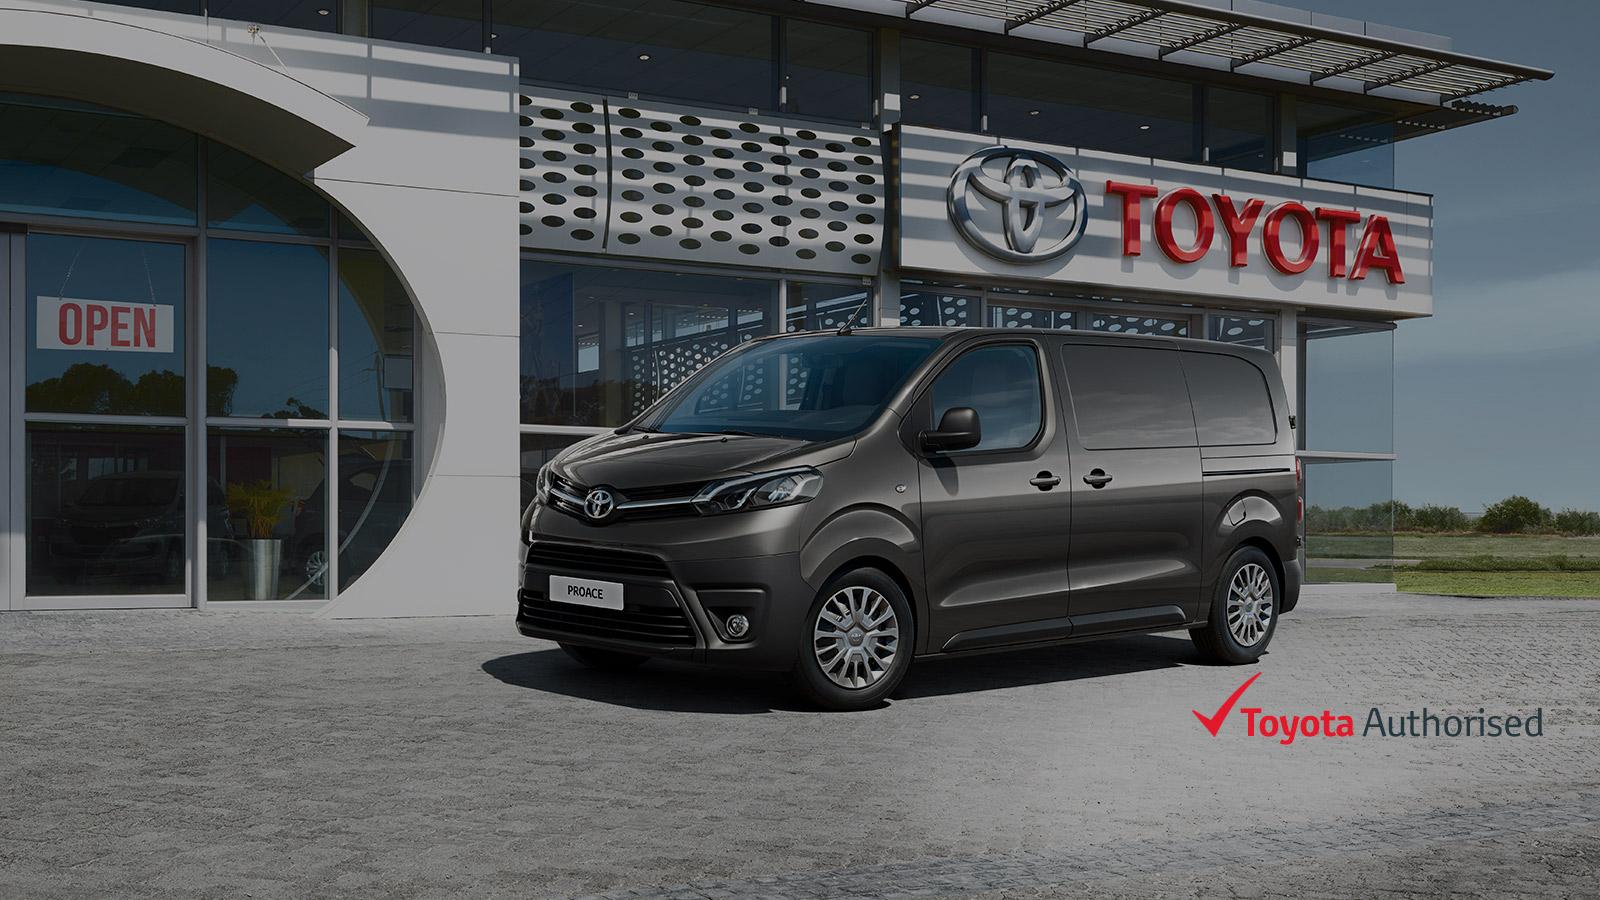 Toyota Bespoke Lcv Conversions